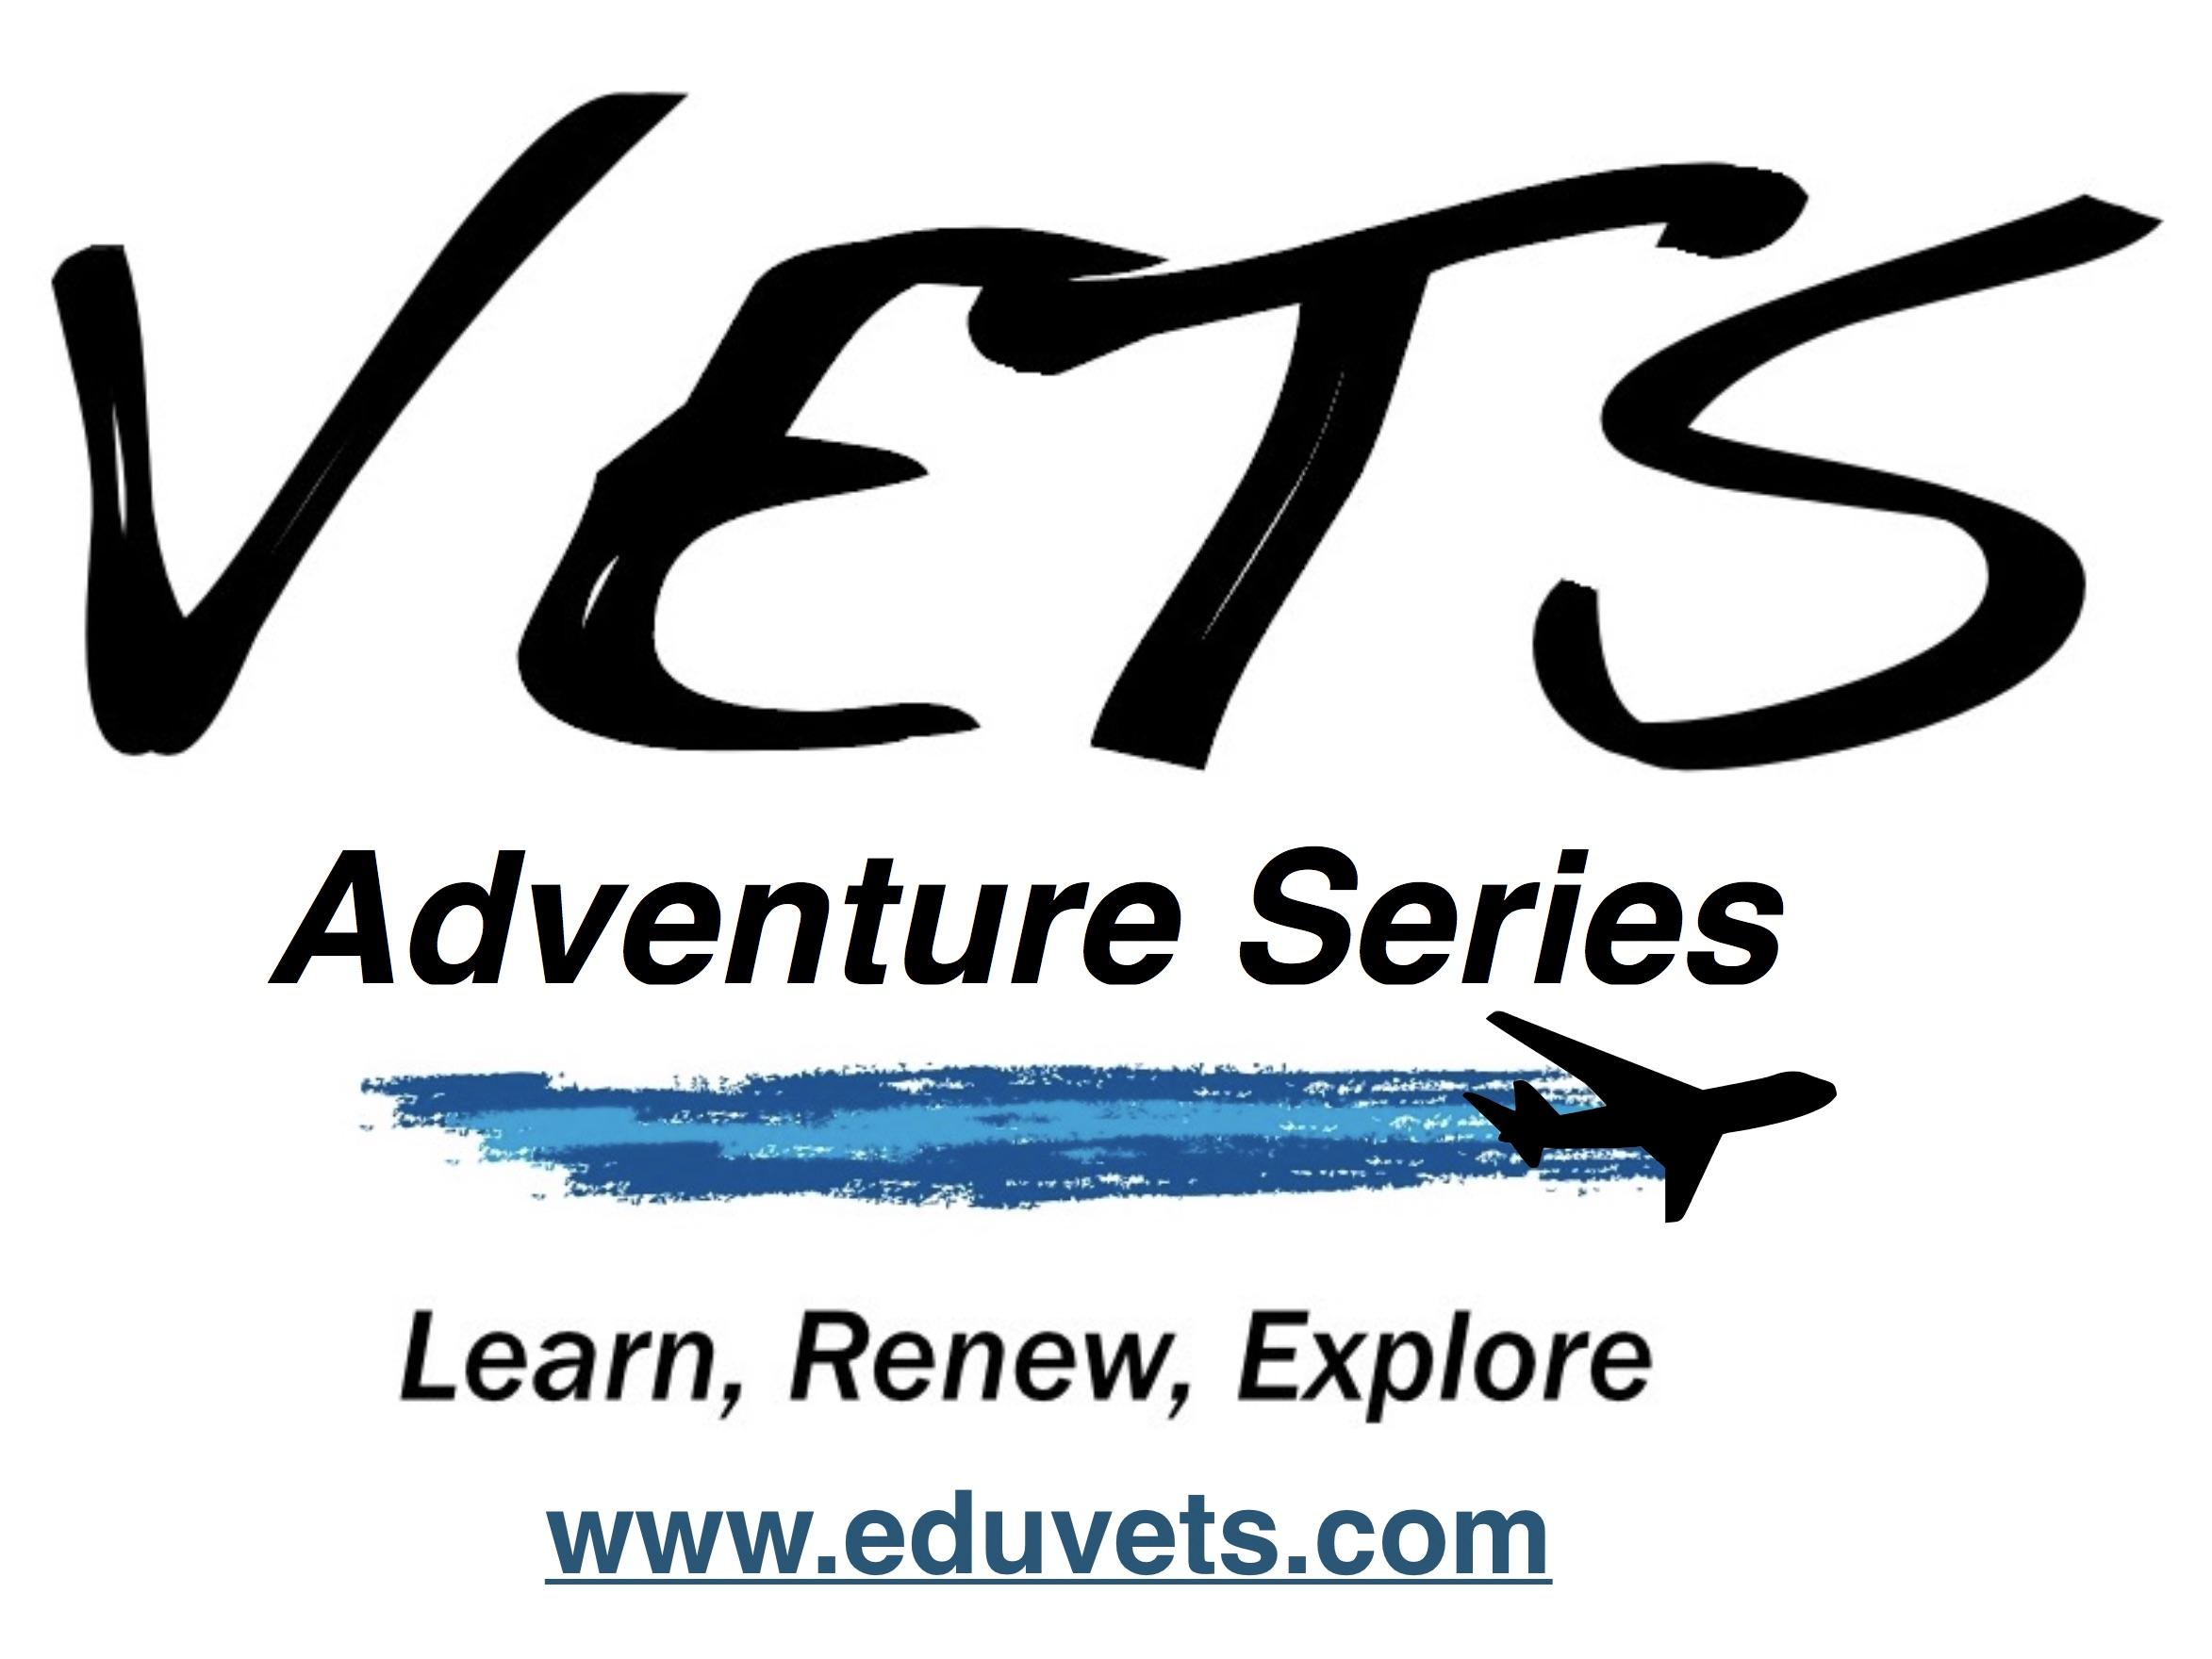 VETS Adventure Series logo no border.jpg